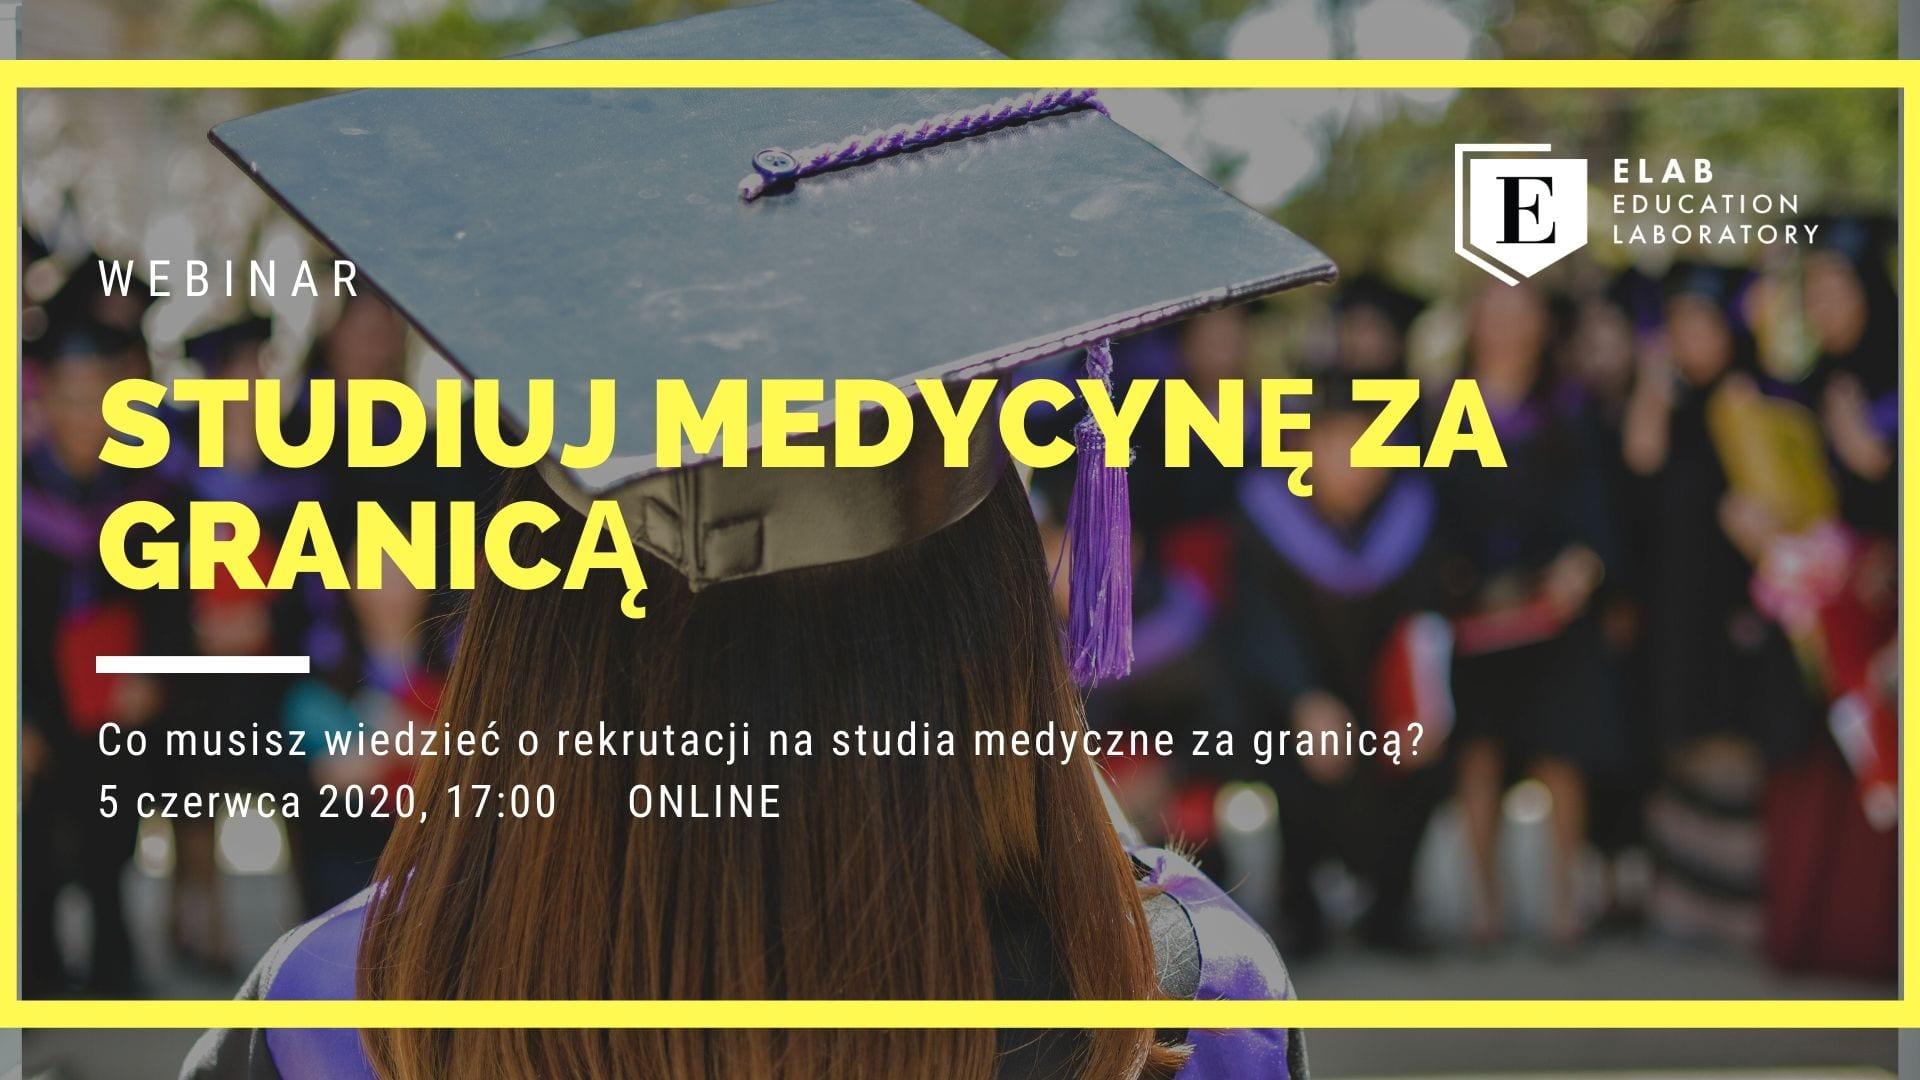 studiuj medycynę za granicą